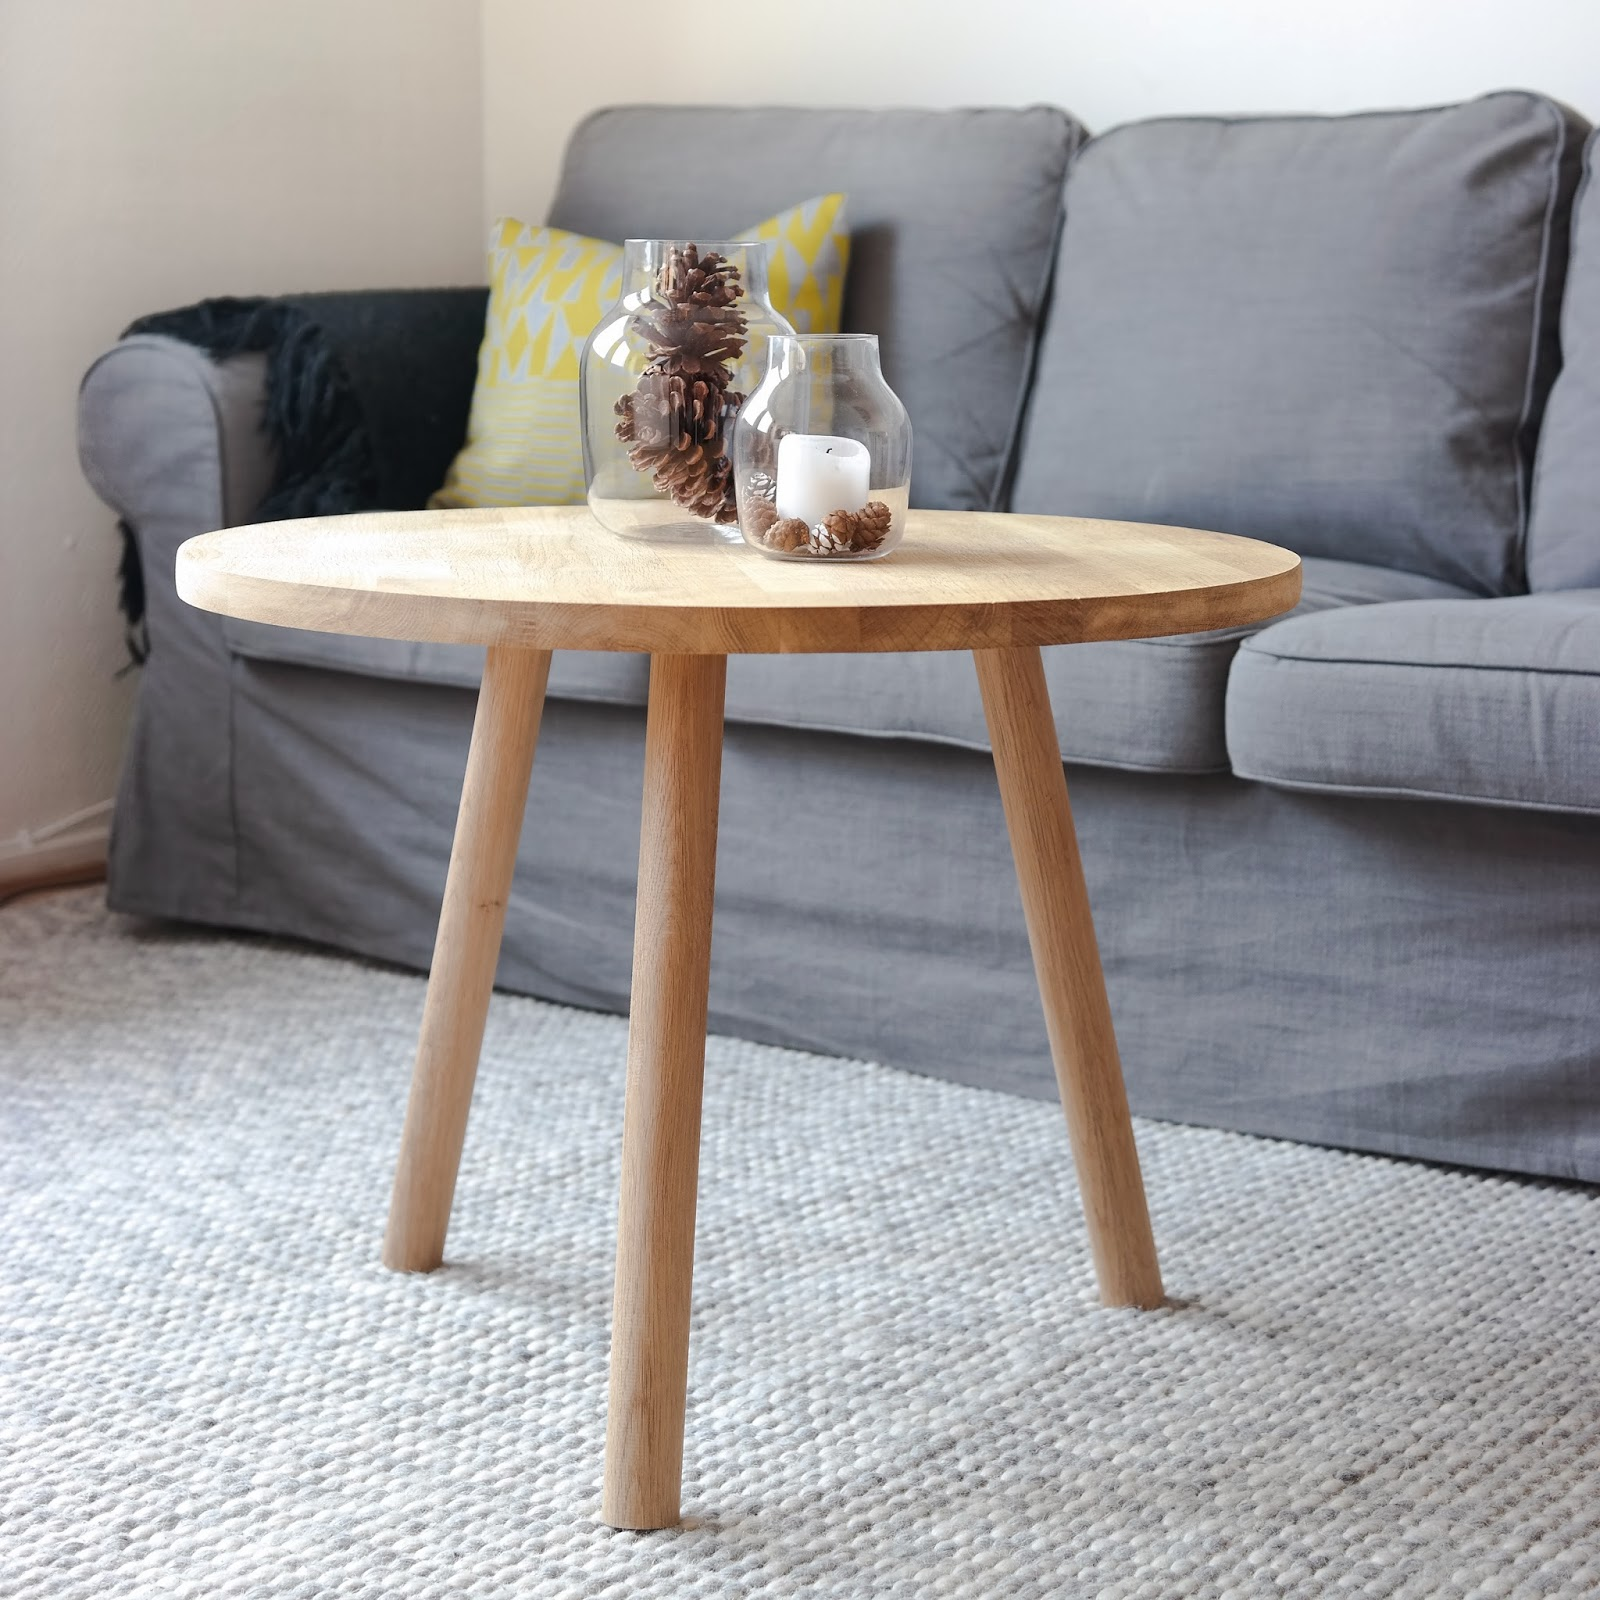 With designs: DIY rundt sofabord i 10 steg